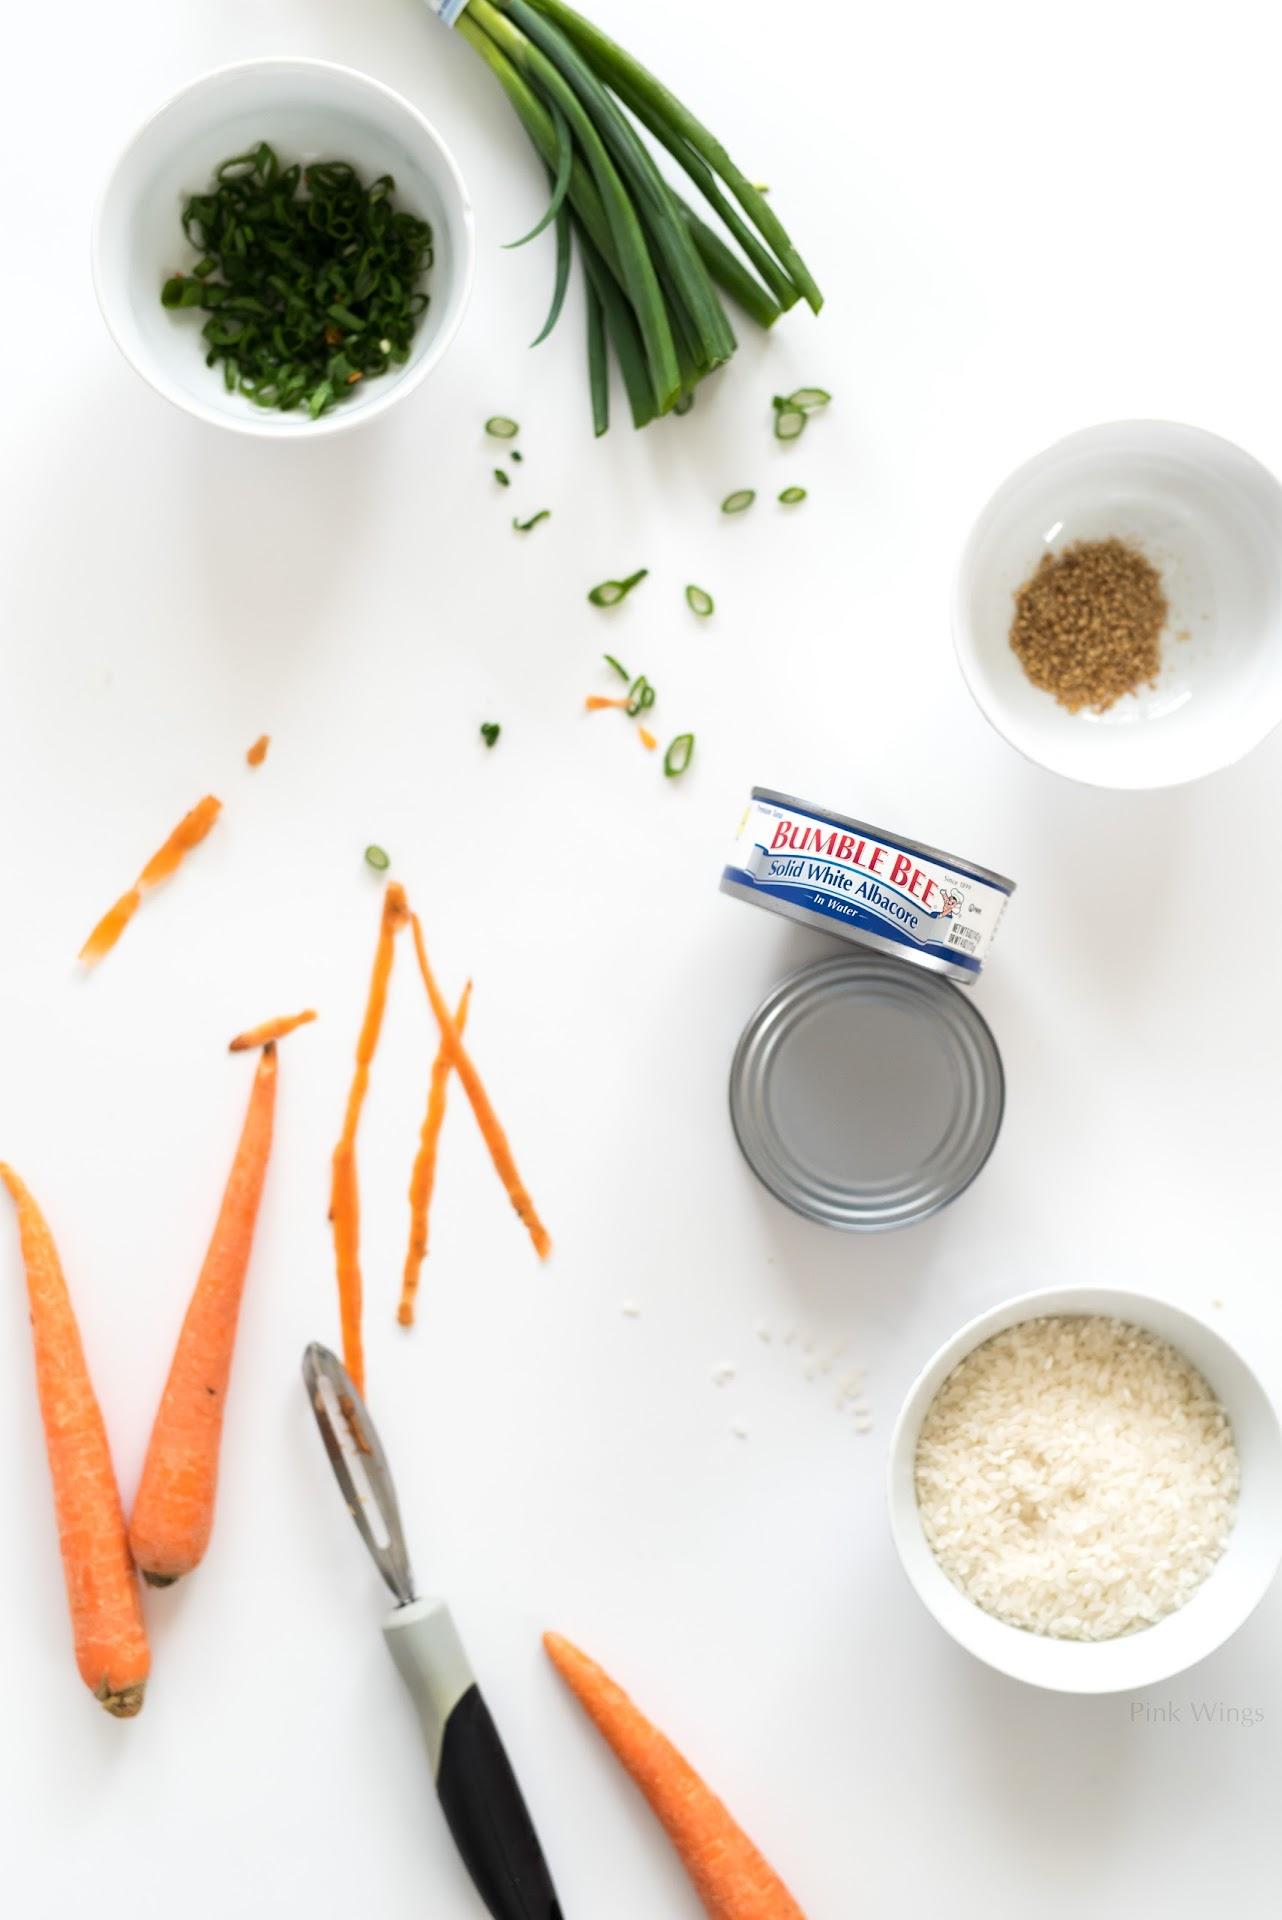 Bumble Bee Solid white albacore, albacore vs chunk light tuna, best canned tuna, tuna recipes, unique tuna recipe, Asian food blog, Korean food